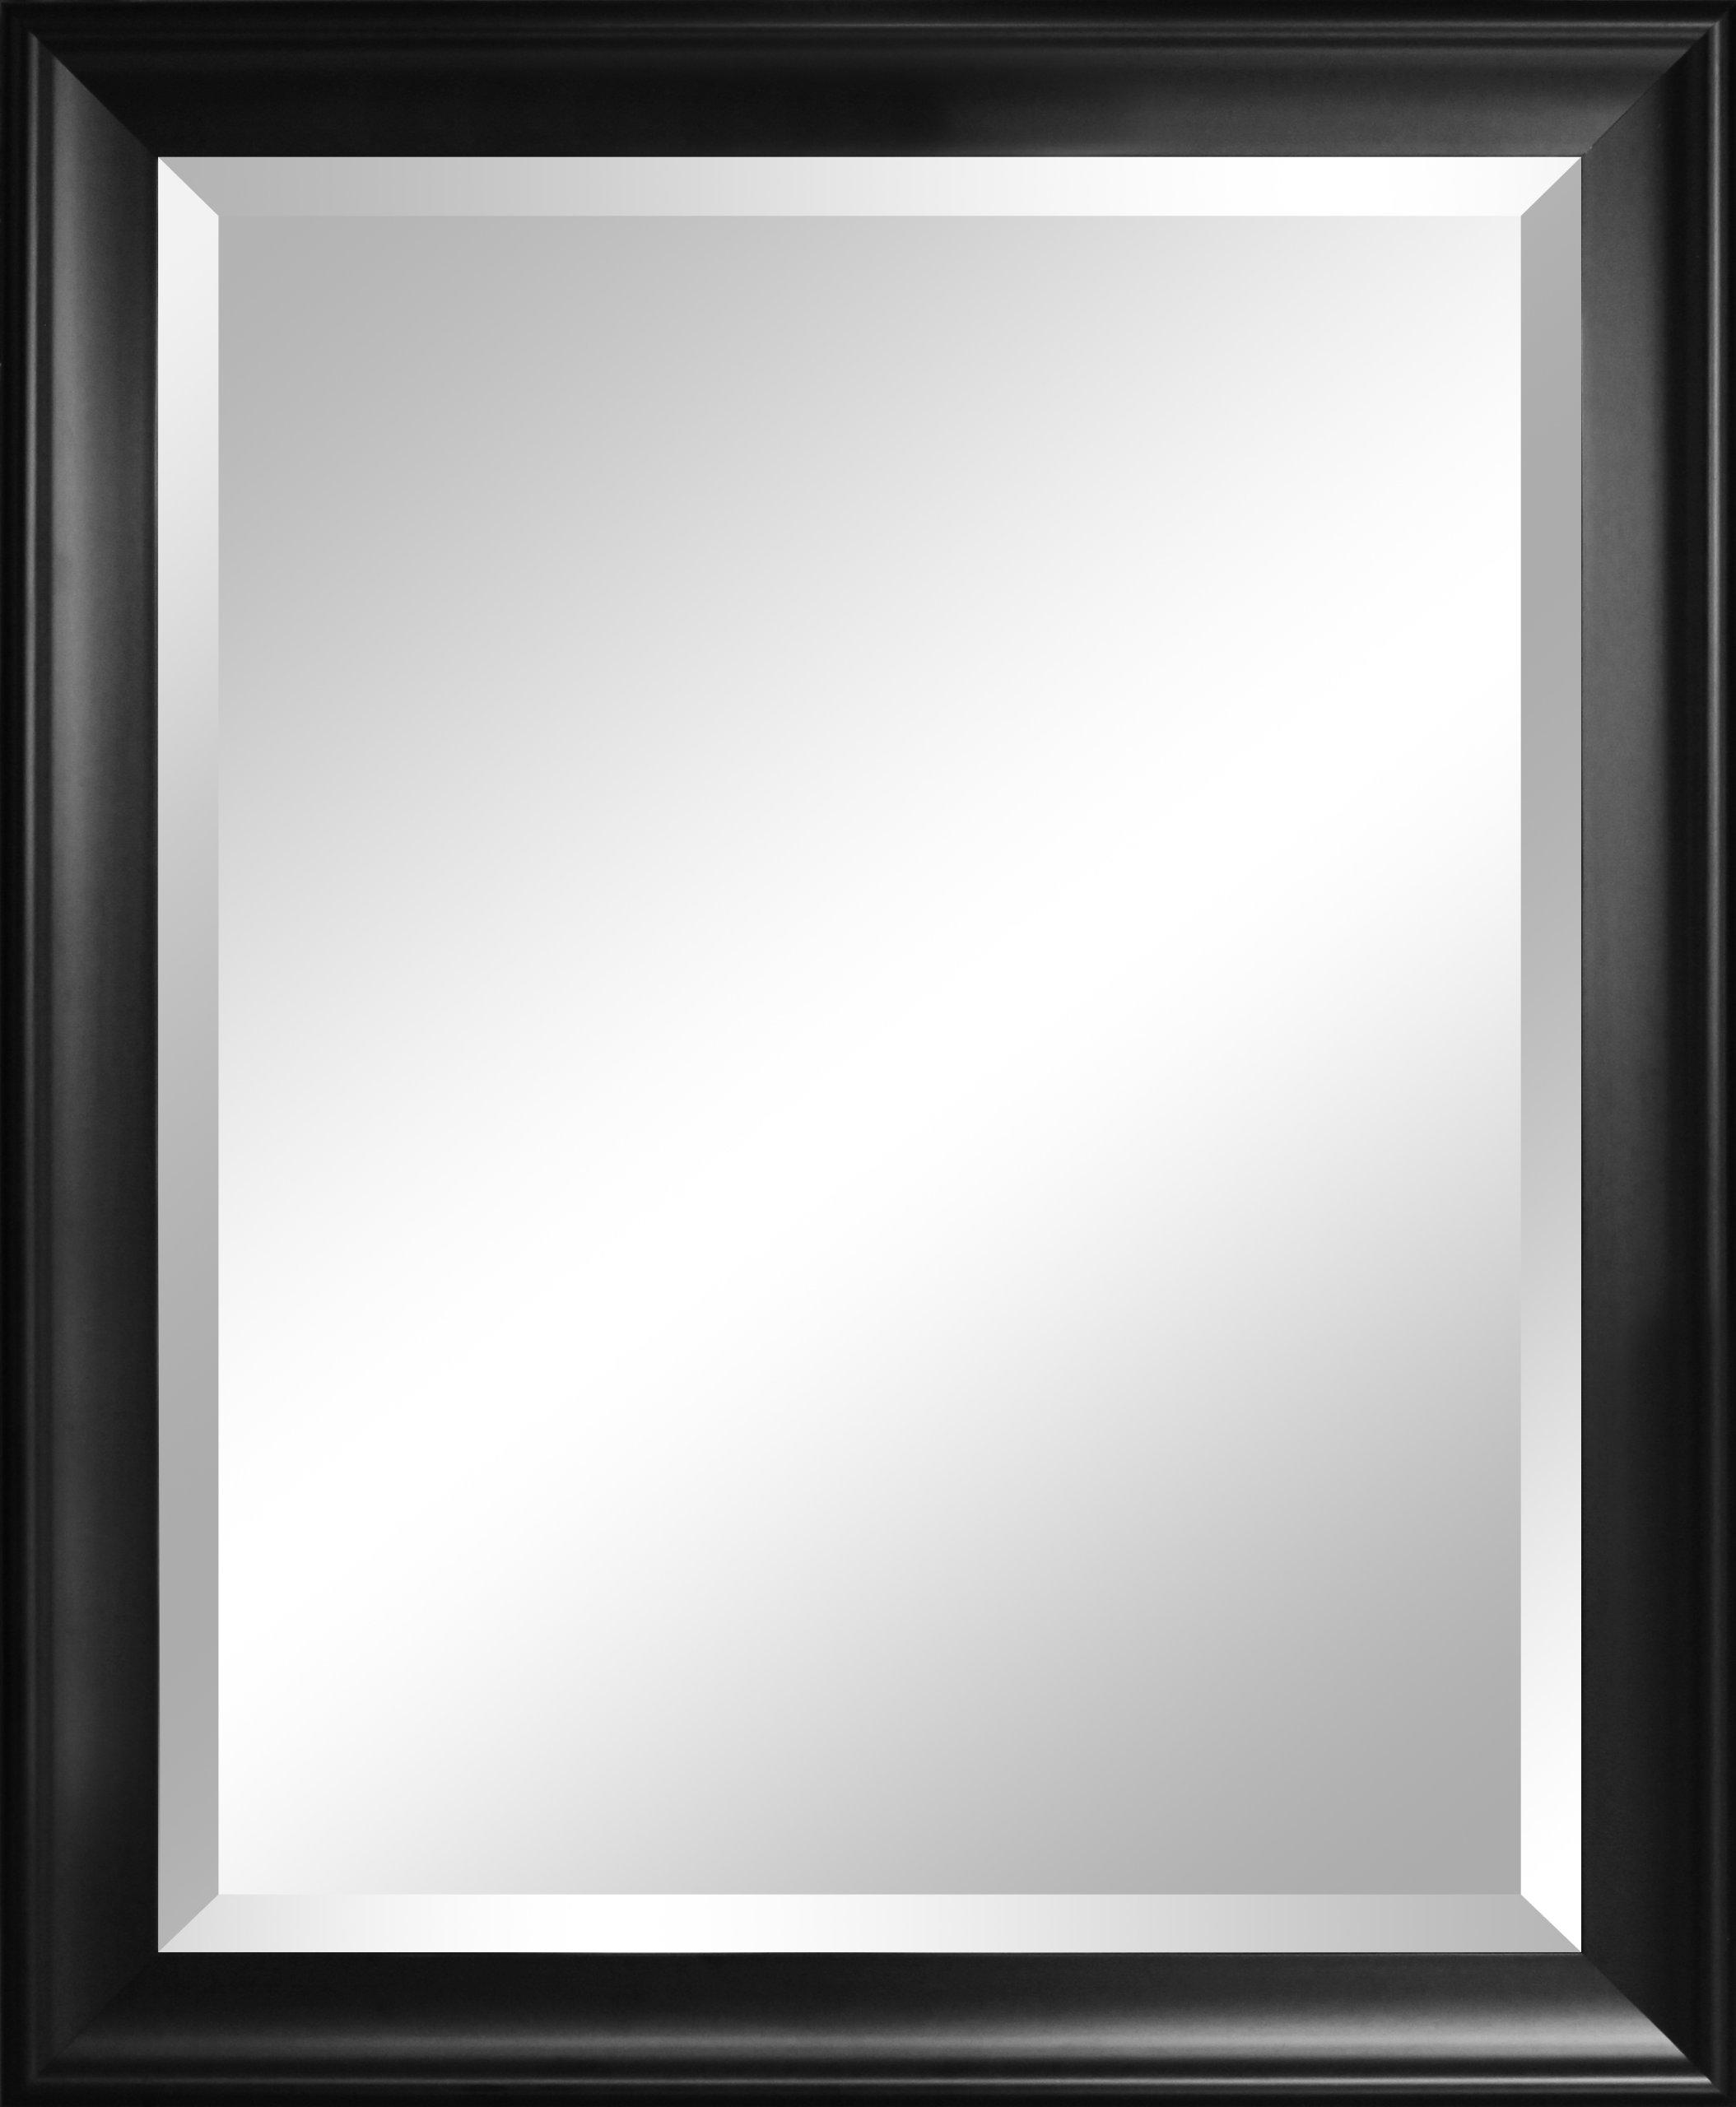 Black Framed Mirrors: Amazon.com